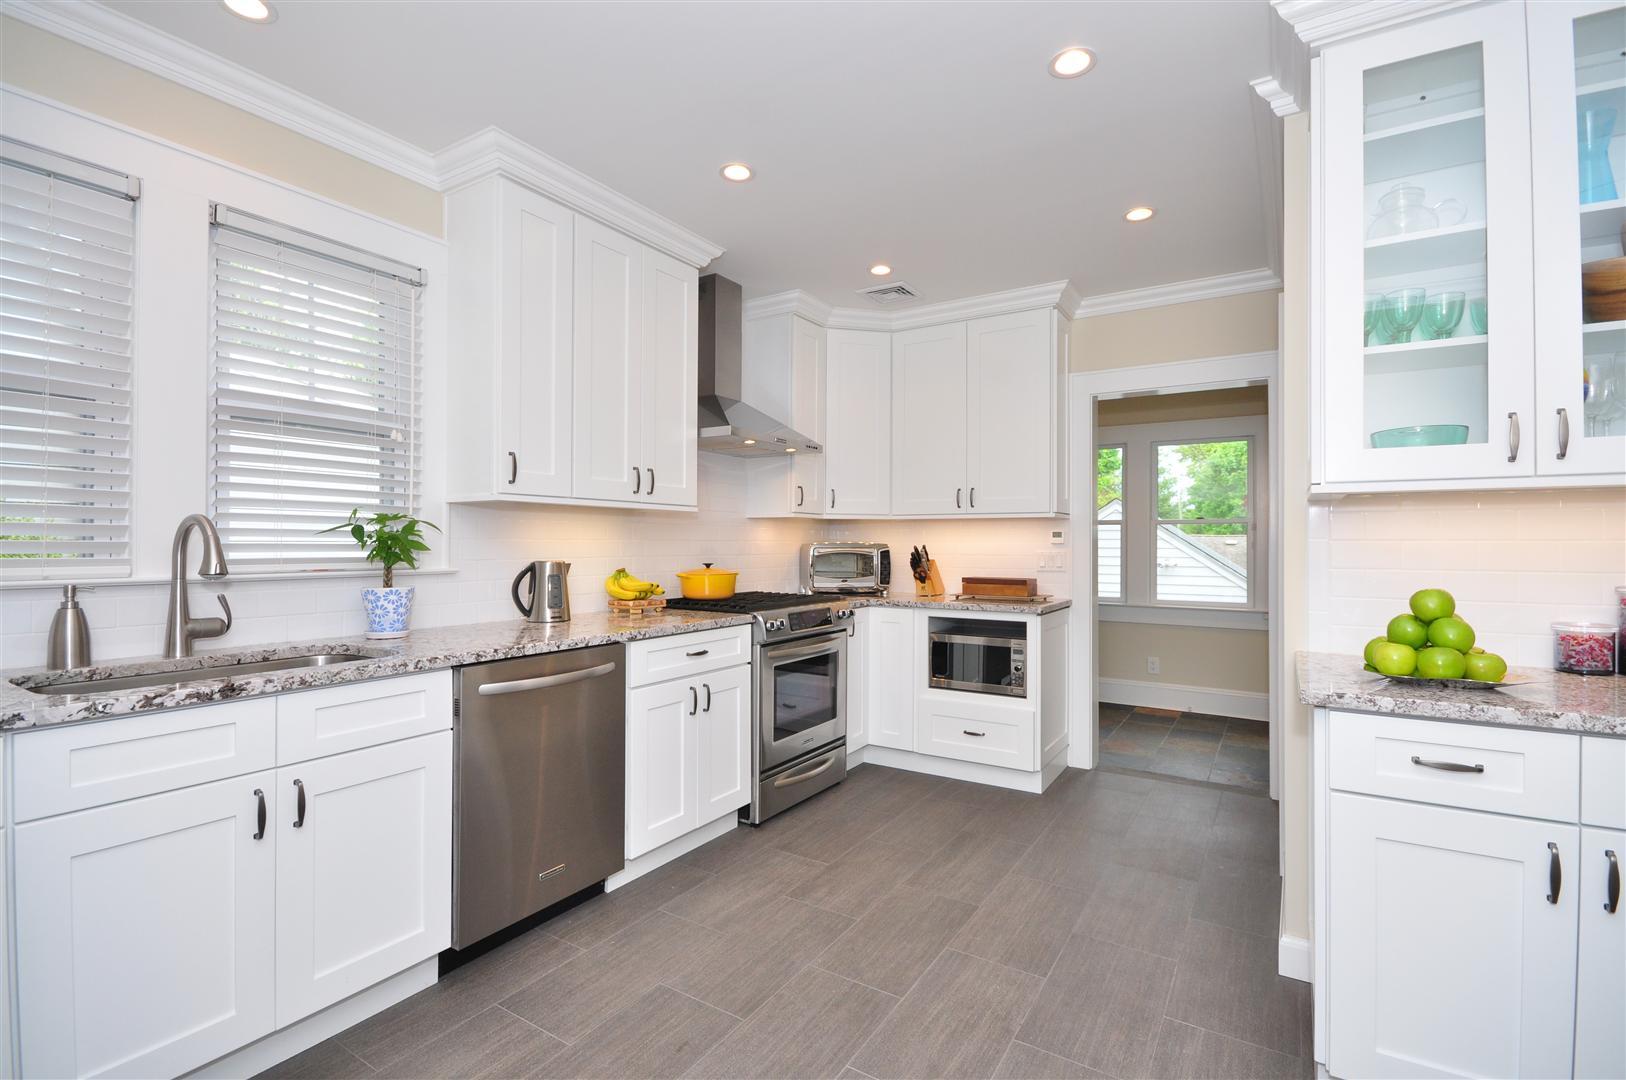 phxgreenbuilders kitchen remodel scottsdale Complete Kitchen Renovations from 9